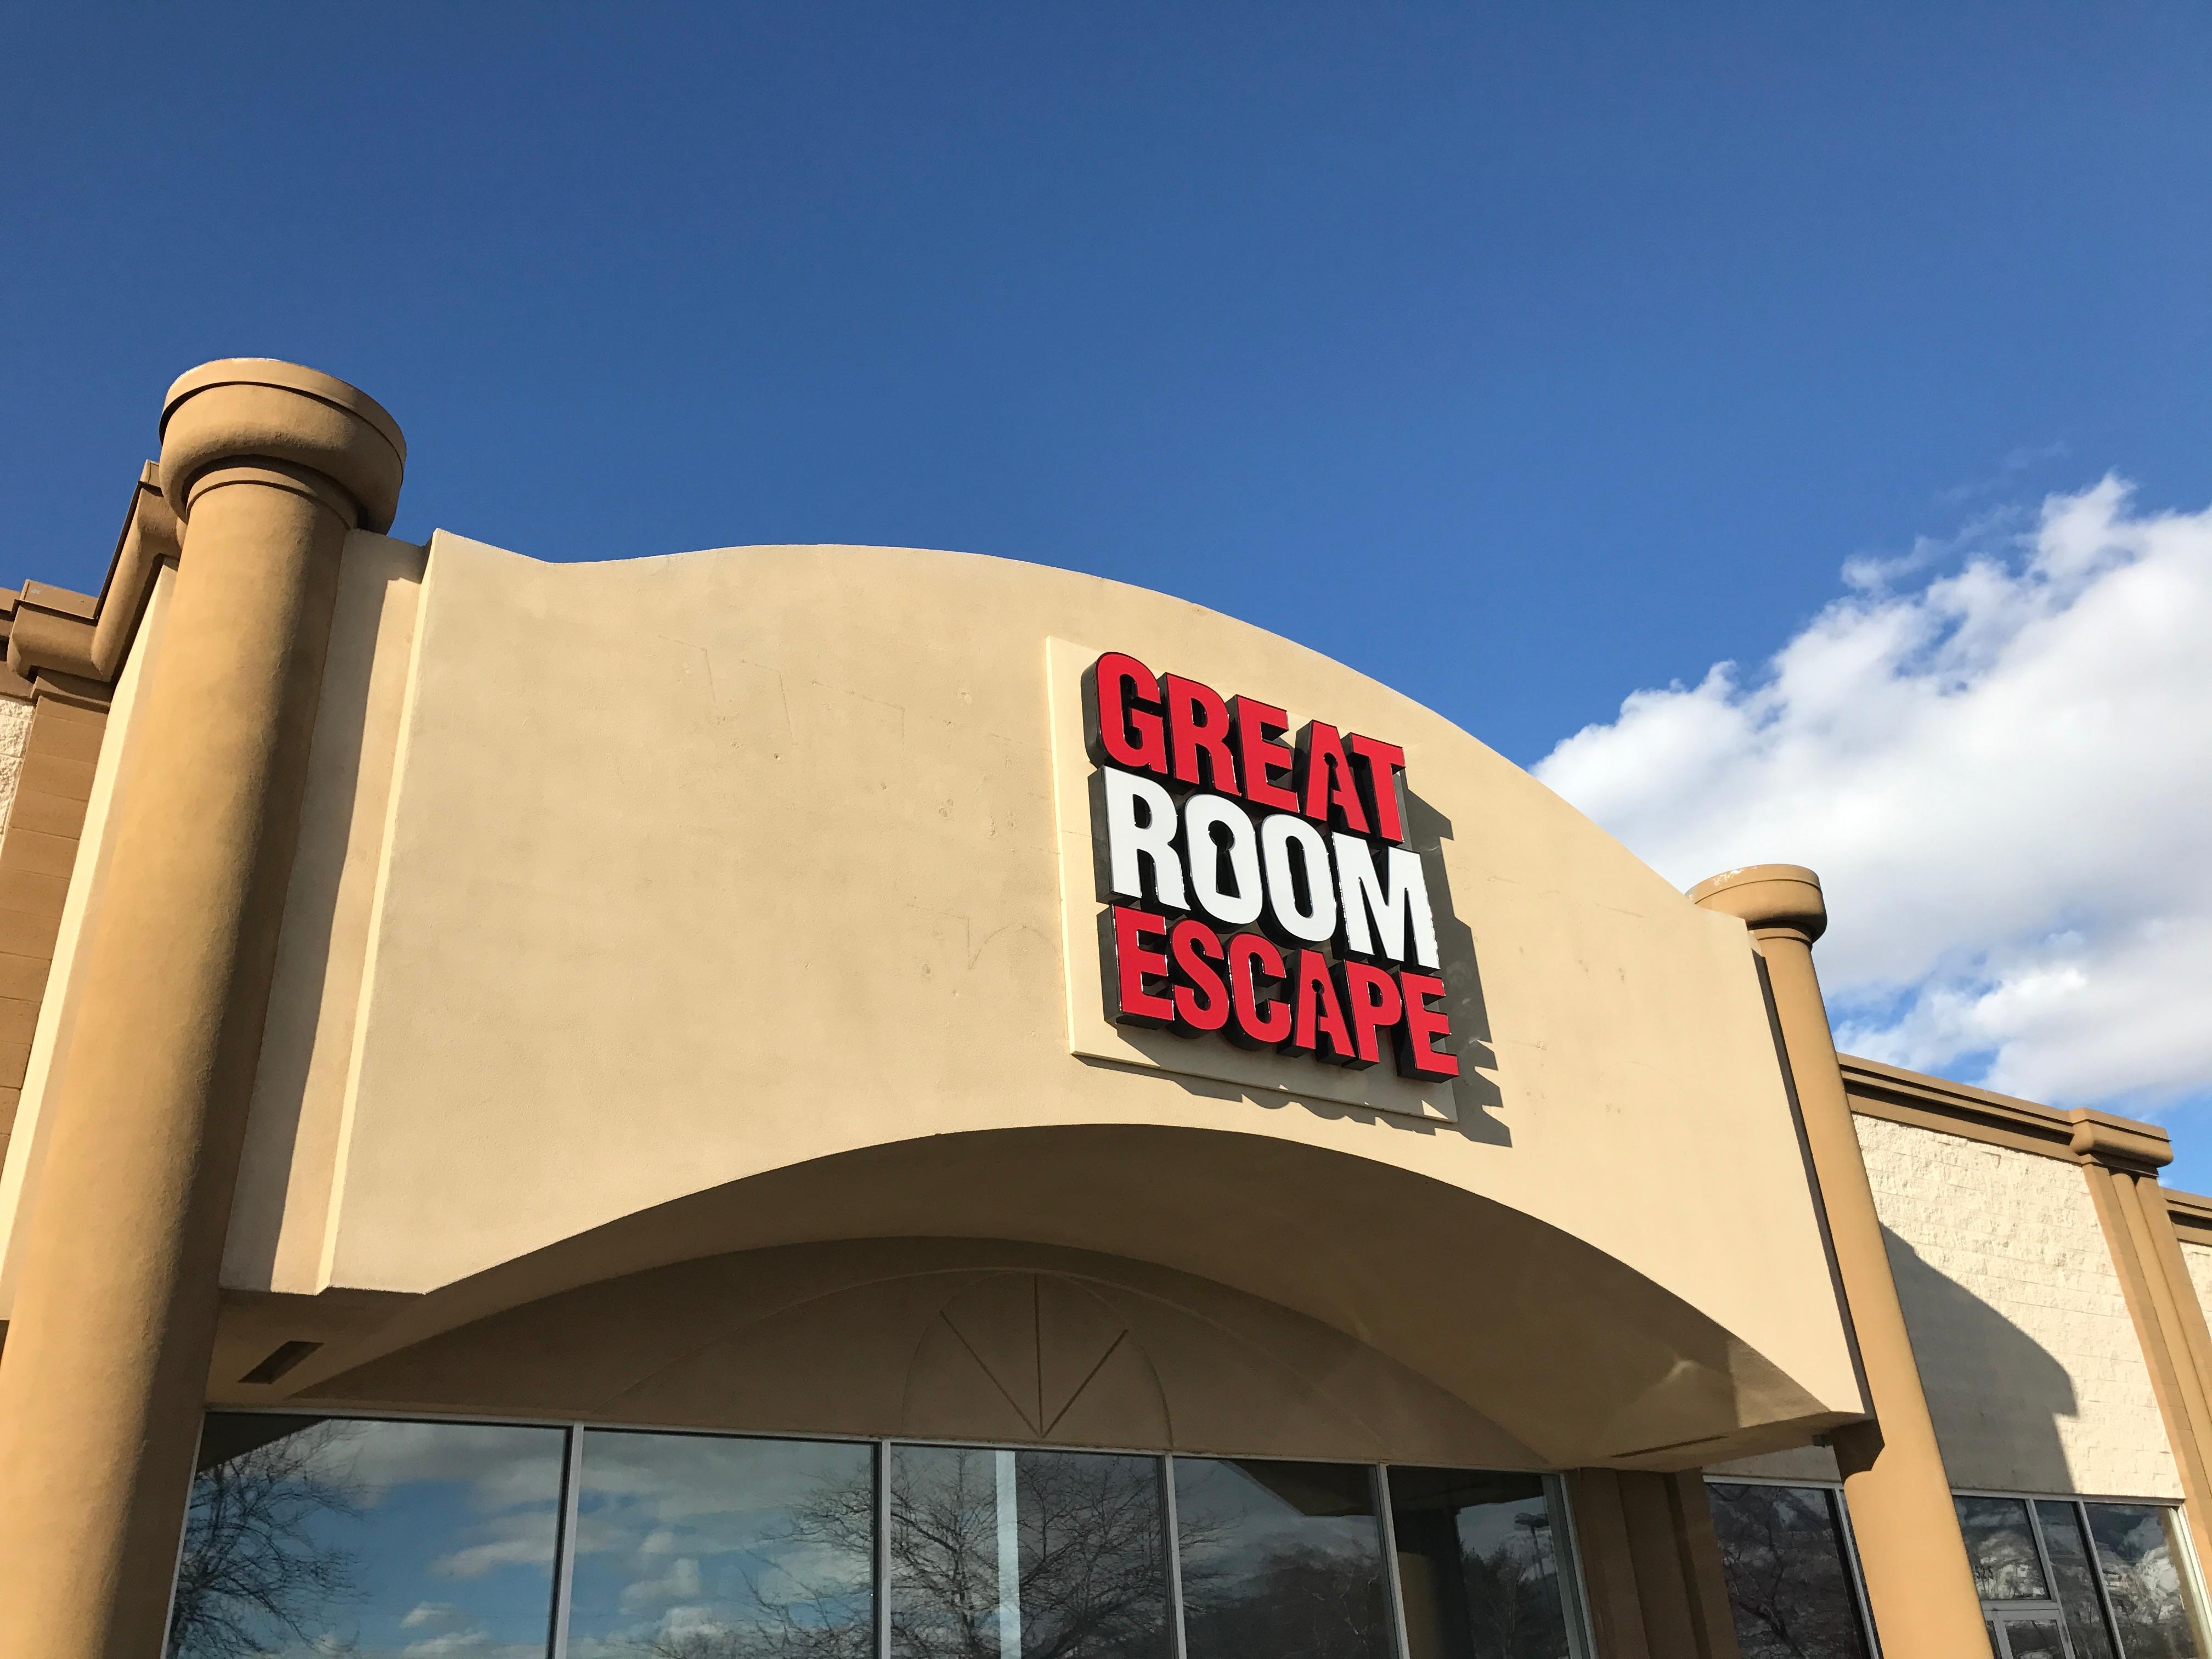 Great Room Escape image 0